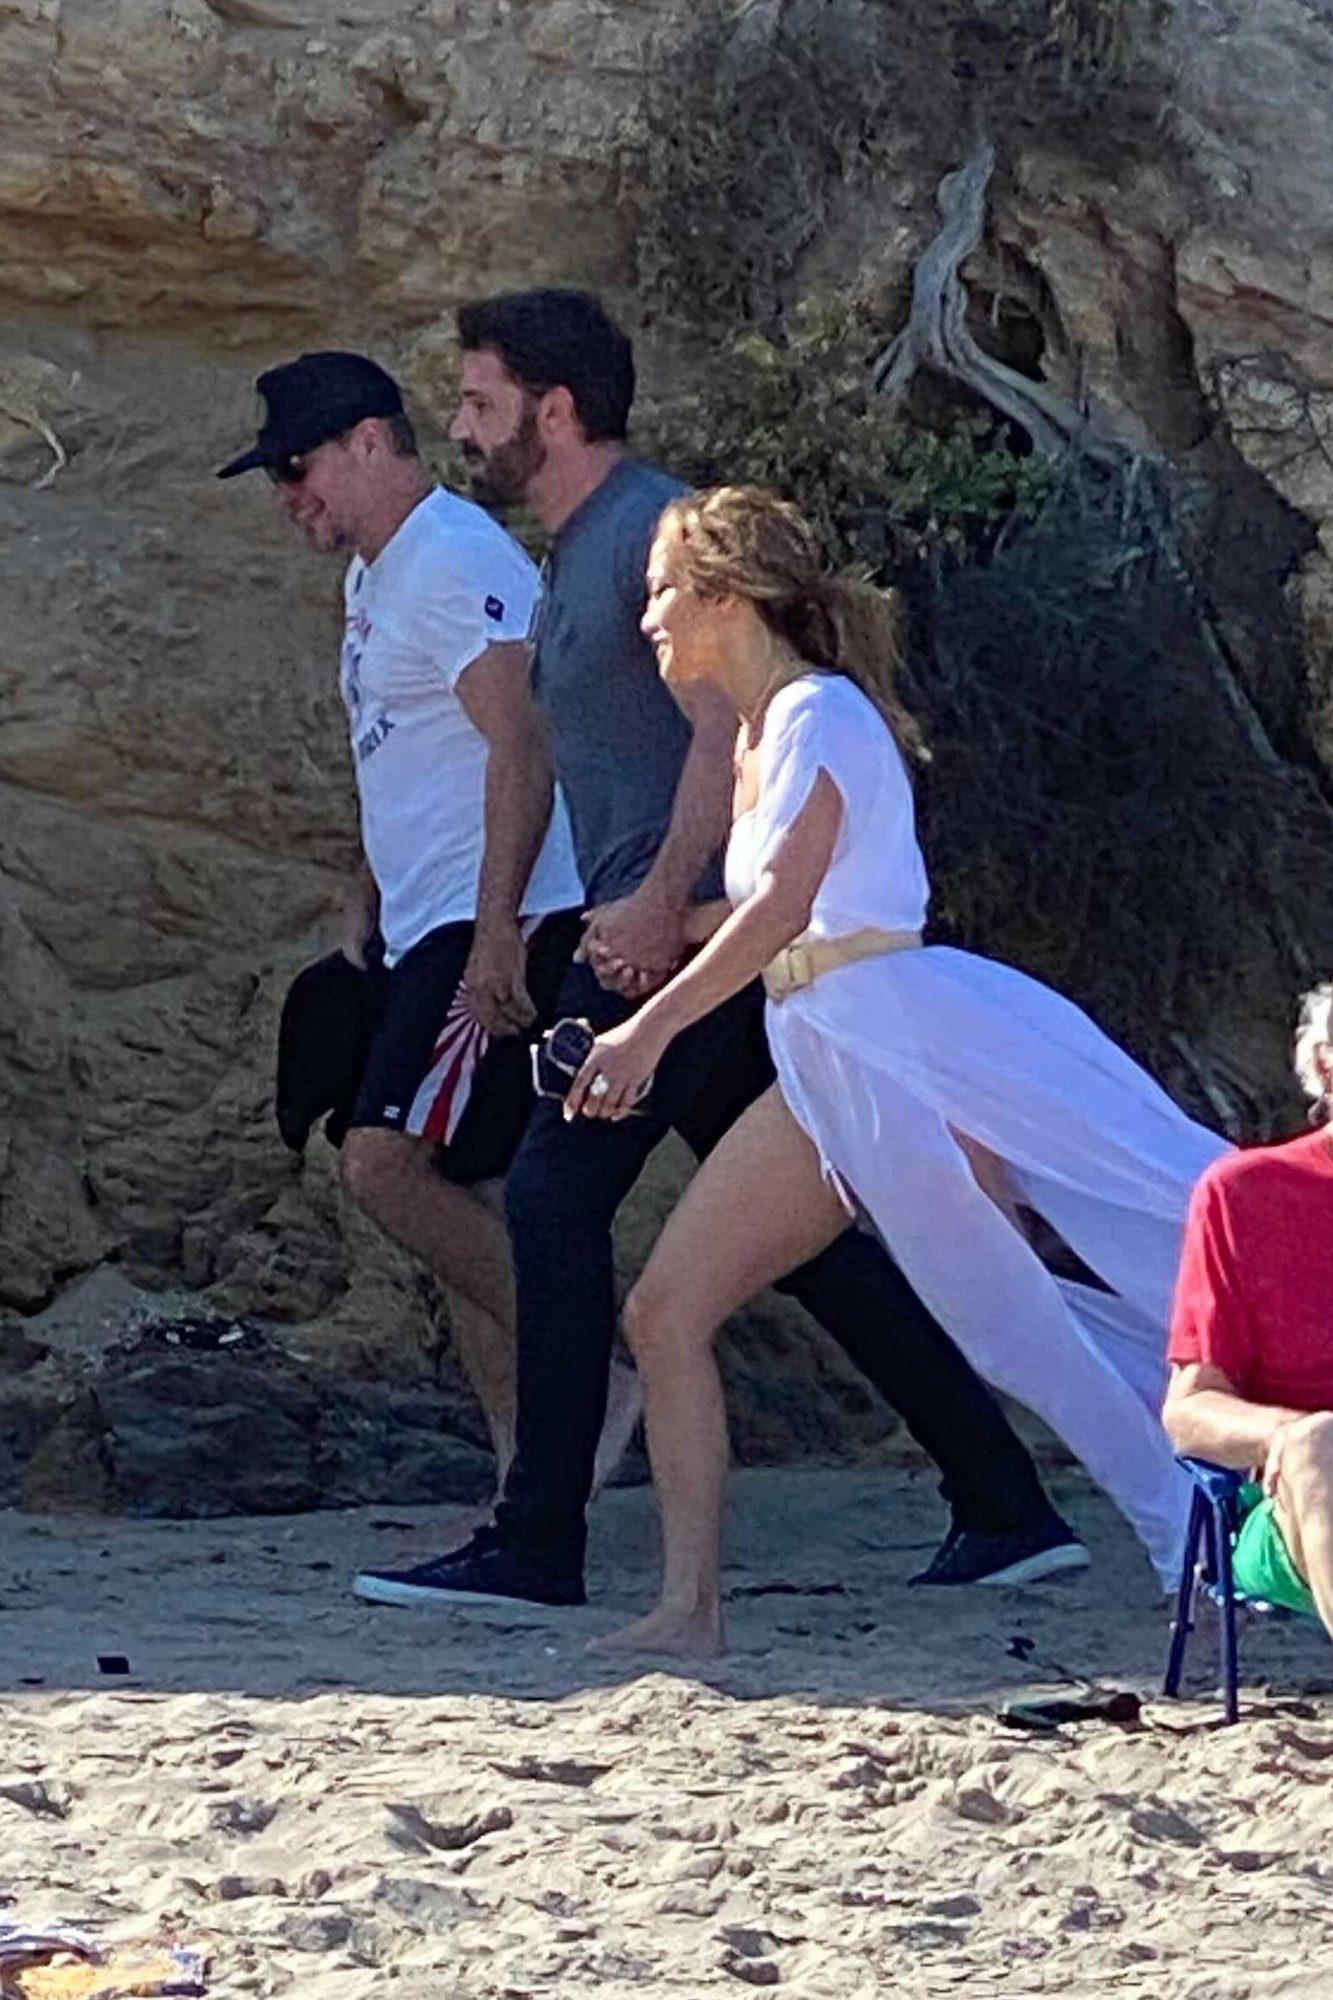 Matt Damon Joins Ben and Jen During Walk on the Beach in LA